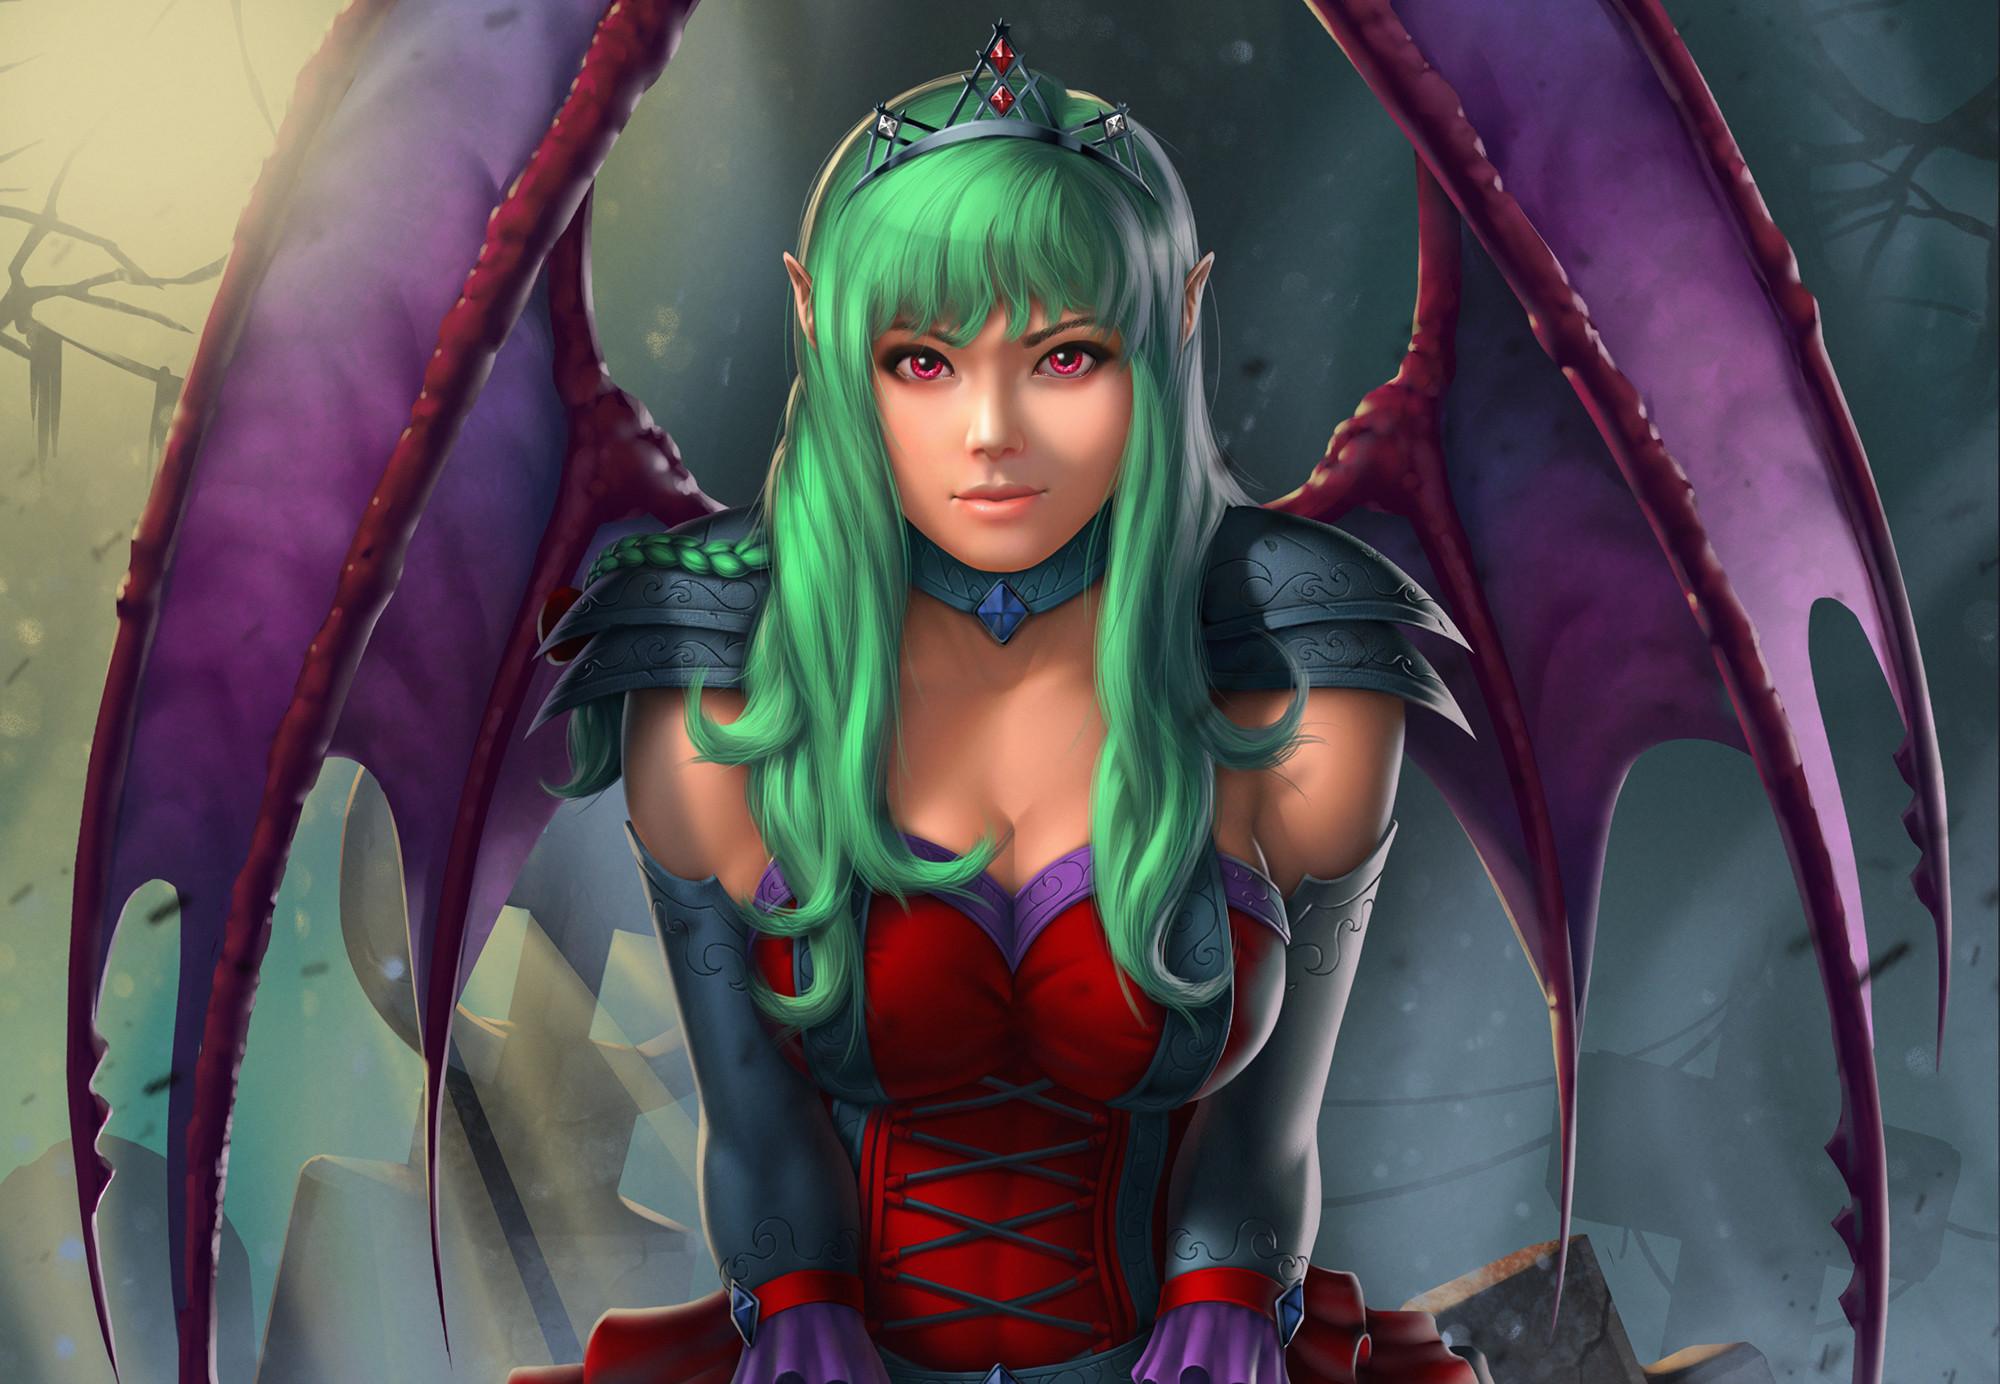 Demonic Girl HD Wallpaper x ID 2000×1384